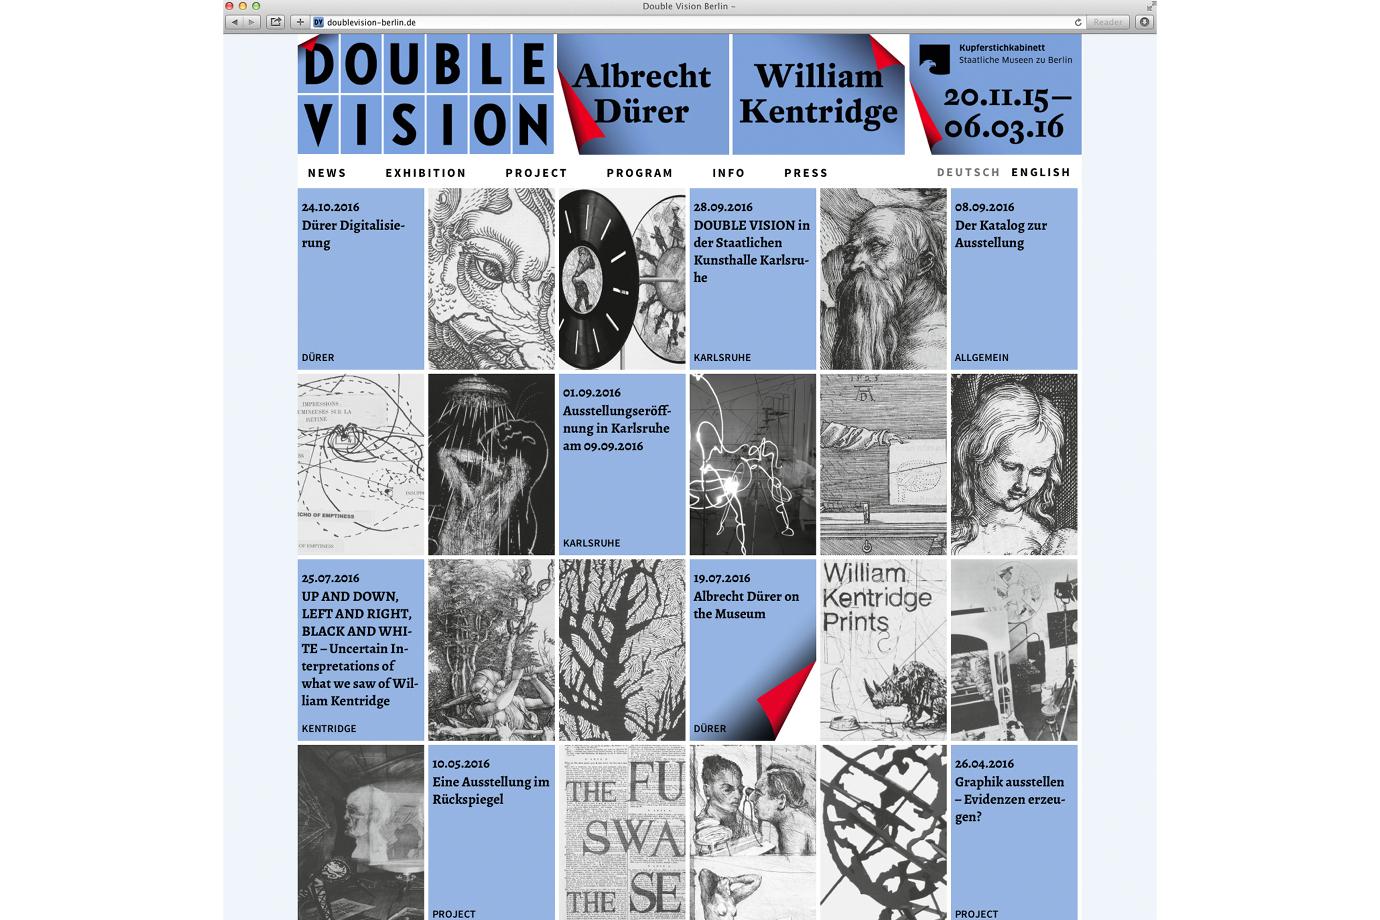 http://e-o-t.de/wordpress/wp-content/uploads/2017/11/2014_eot-DoubleVision-Web-0.jpg